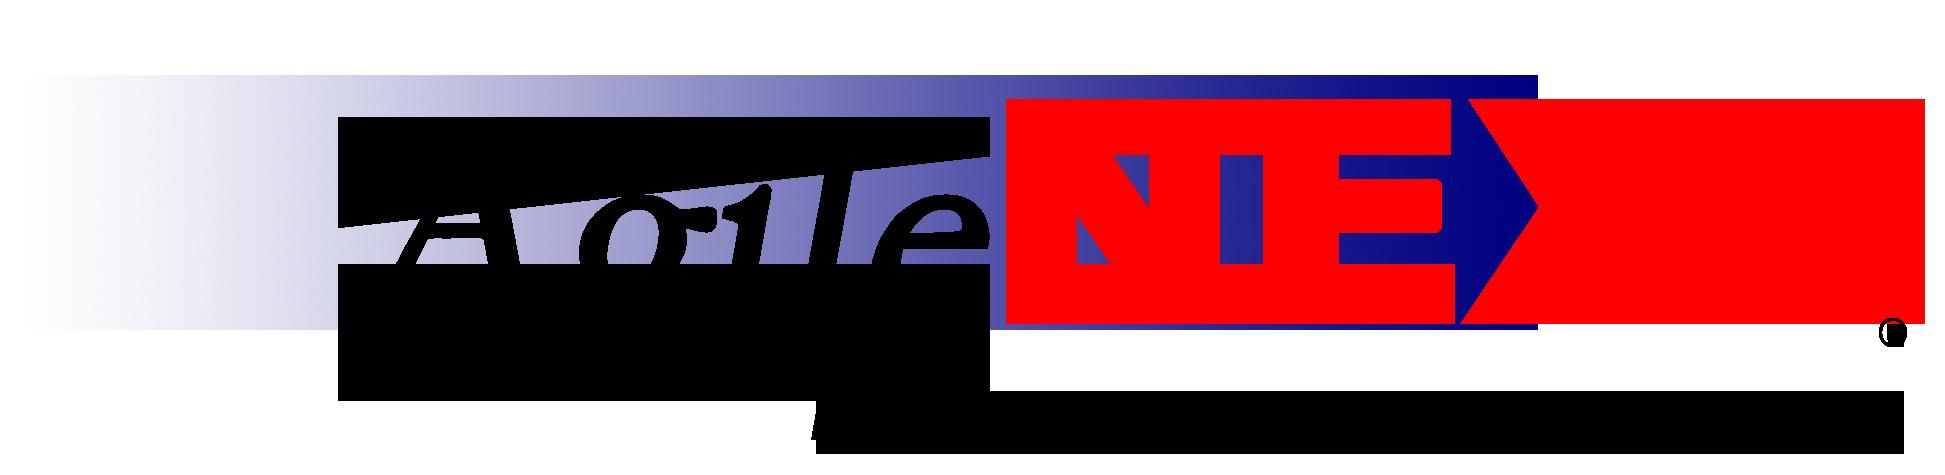 AgileNext-website